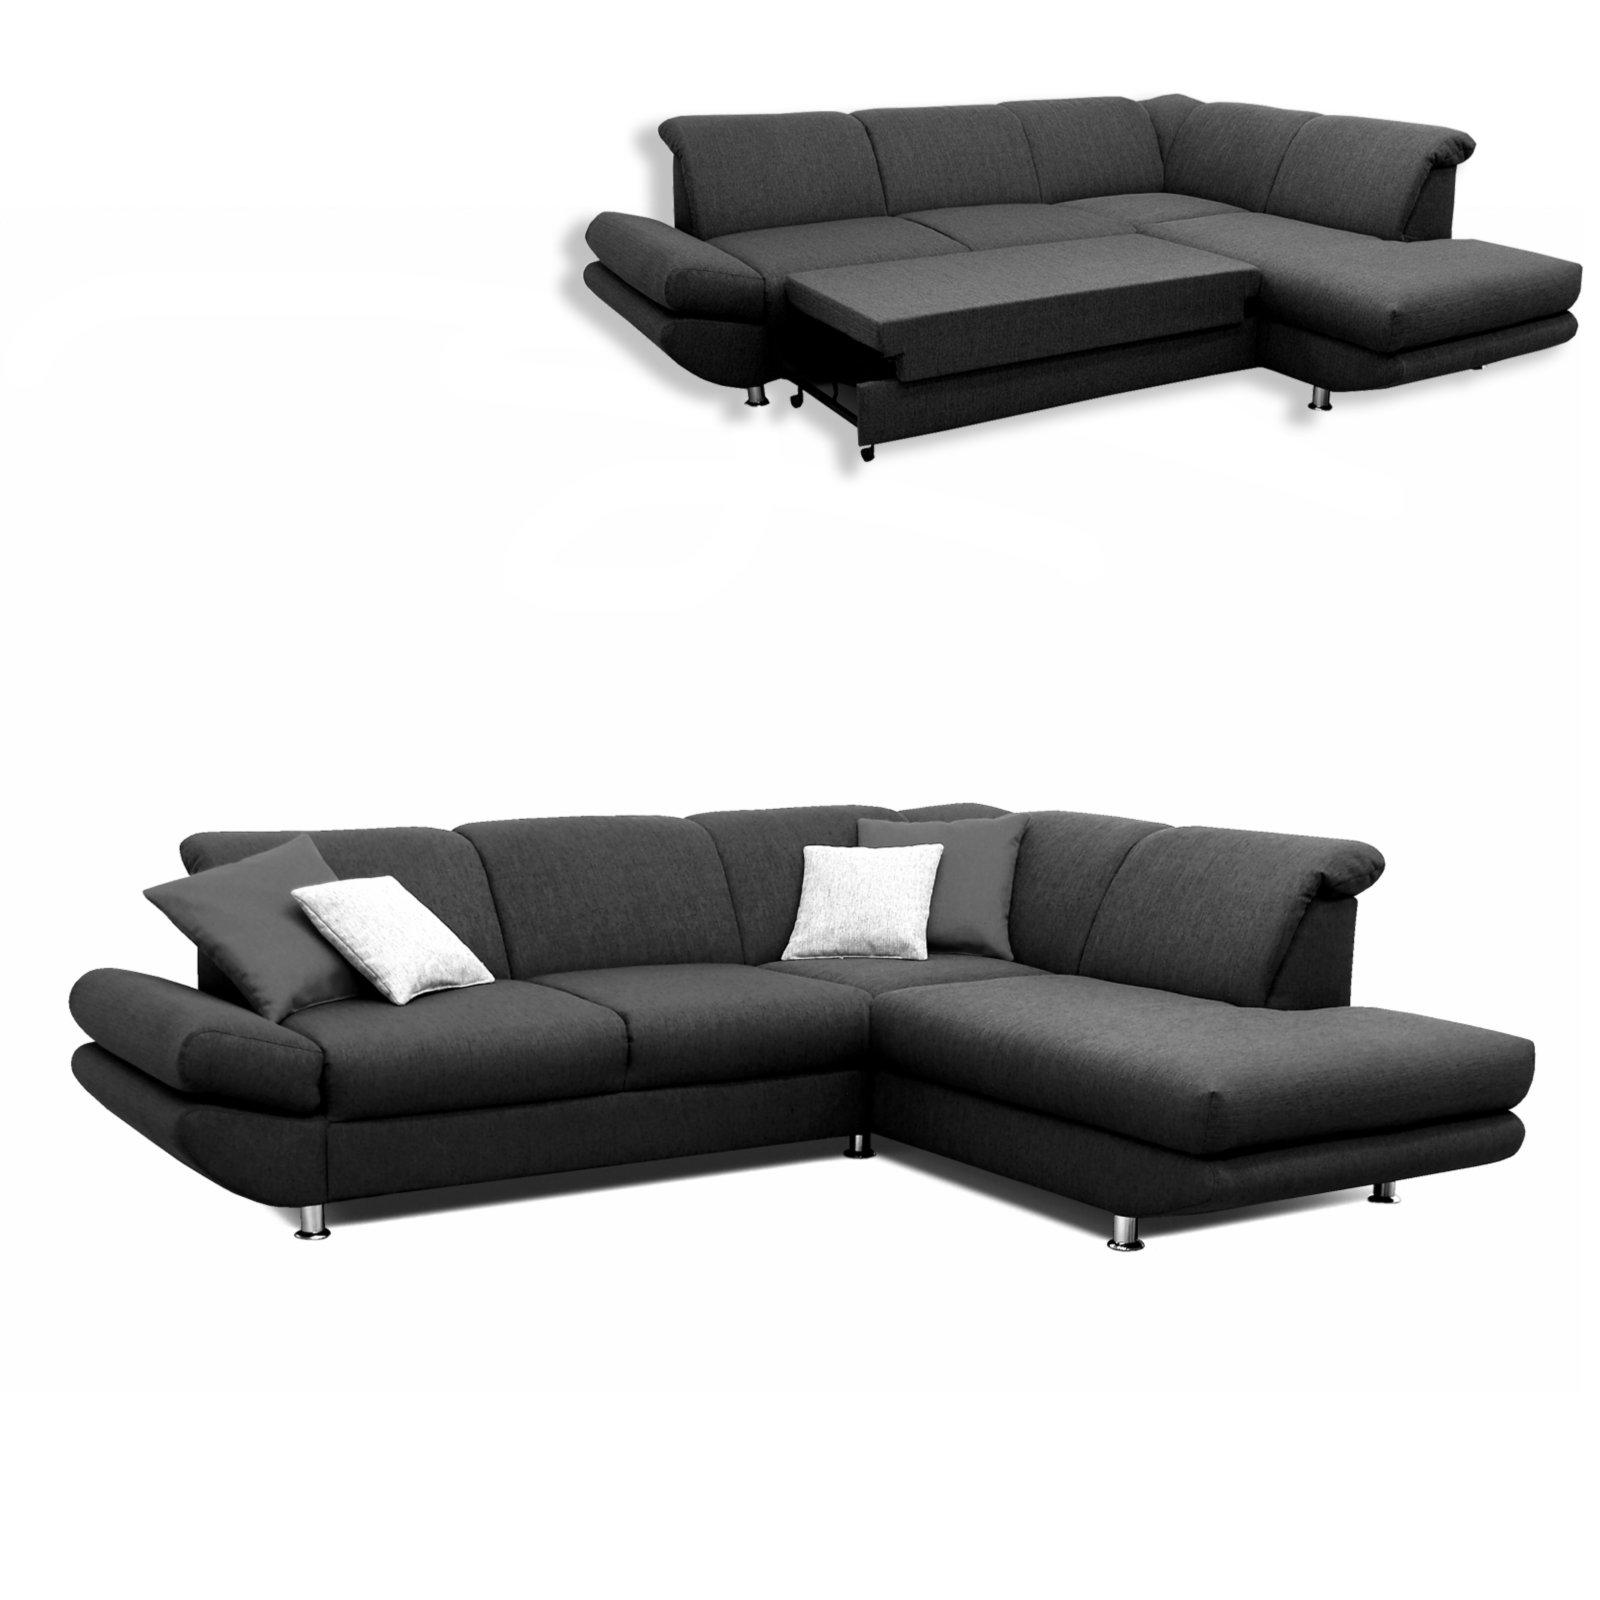 polsterecke anthrazit liegefunktion ottomane rechts ecksofas l form sofas couches. Black Bedroom Furniture Sets. Home Design Ideas